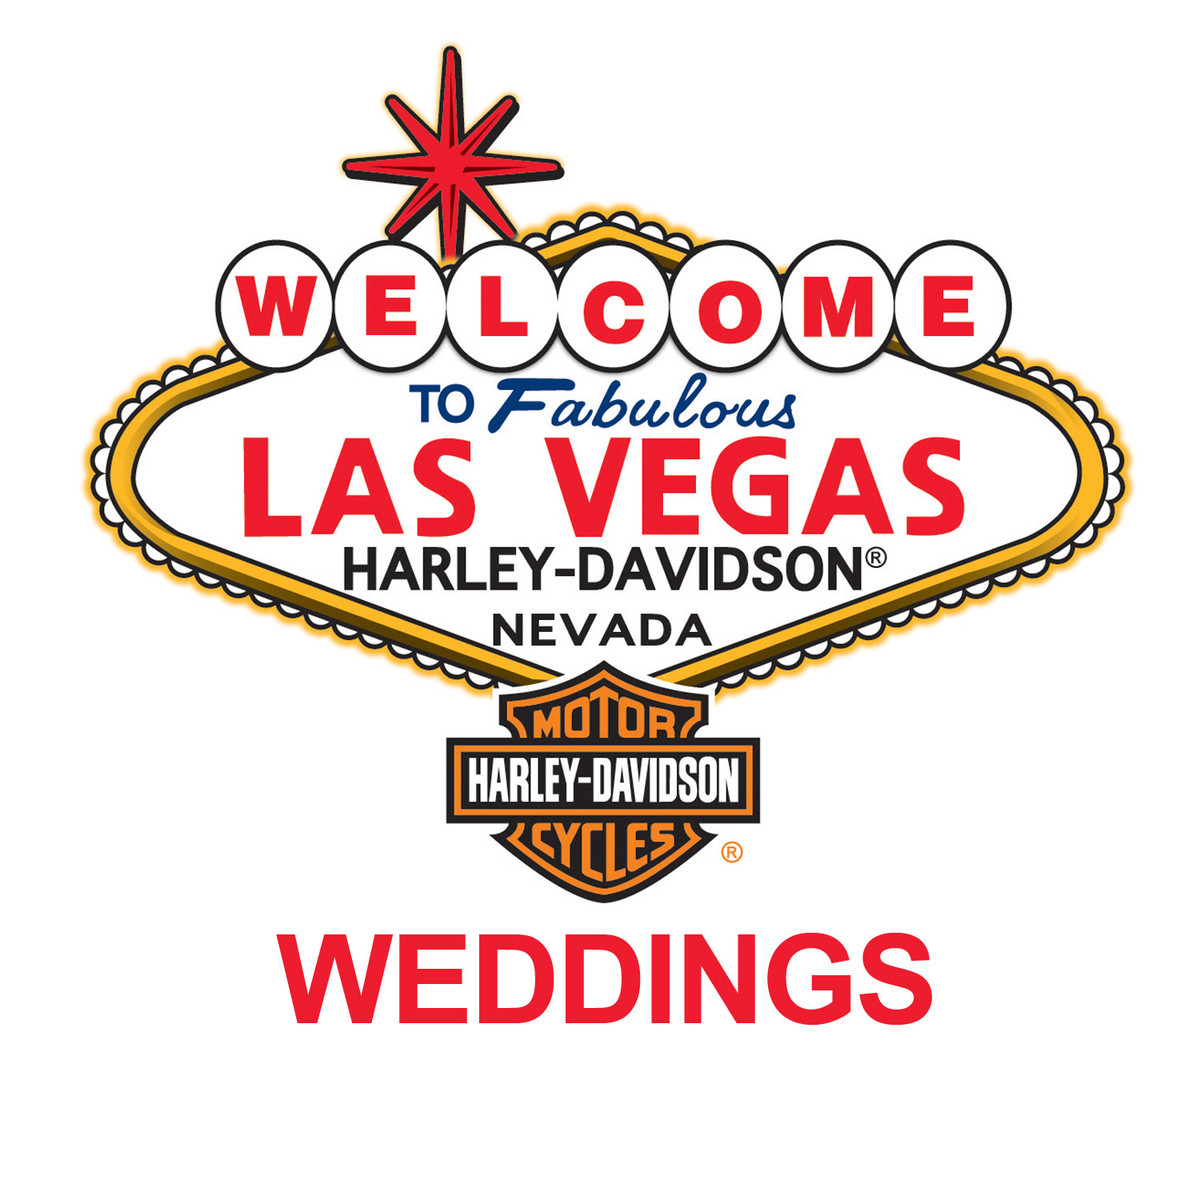 Las Vegas Harley Davidson Weddings - Venue - Las Vegas, NV - WeddingWire